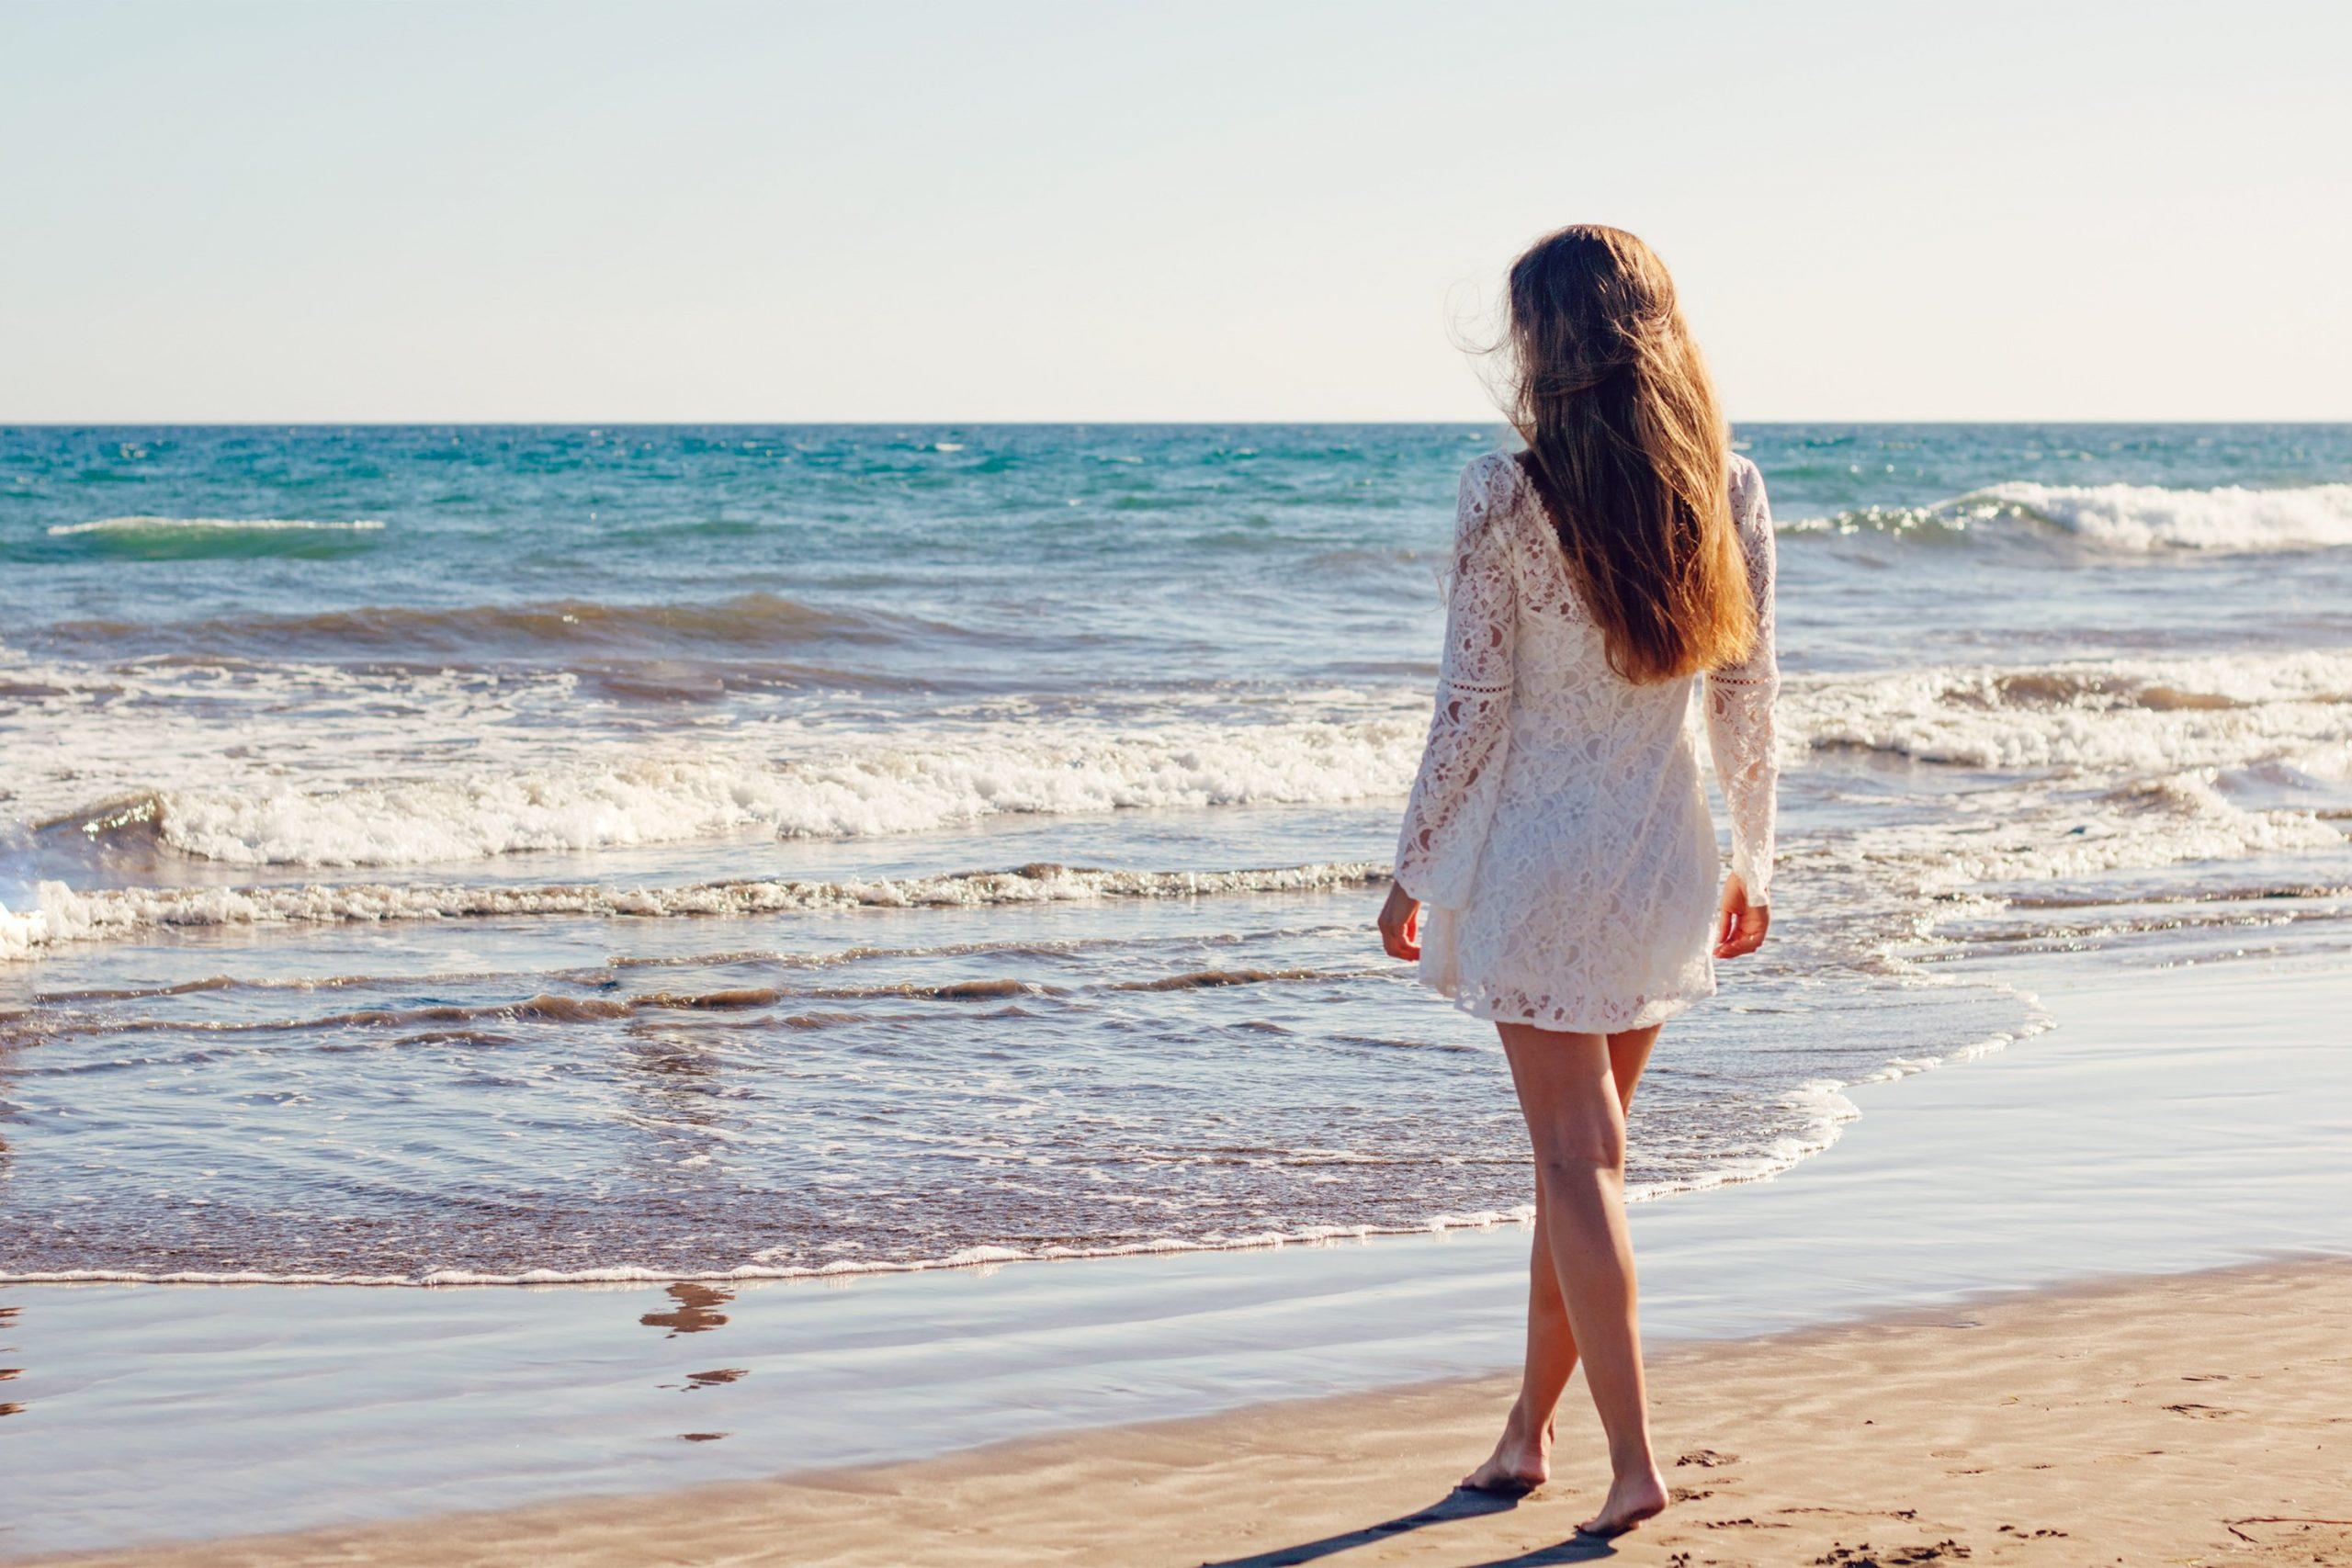 young woman, beach, dress